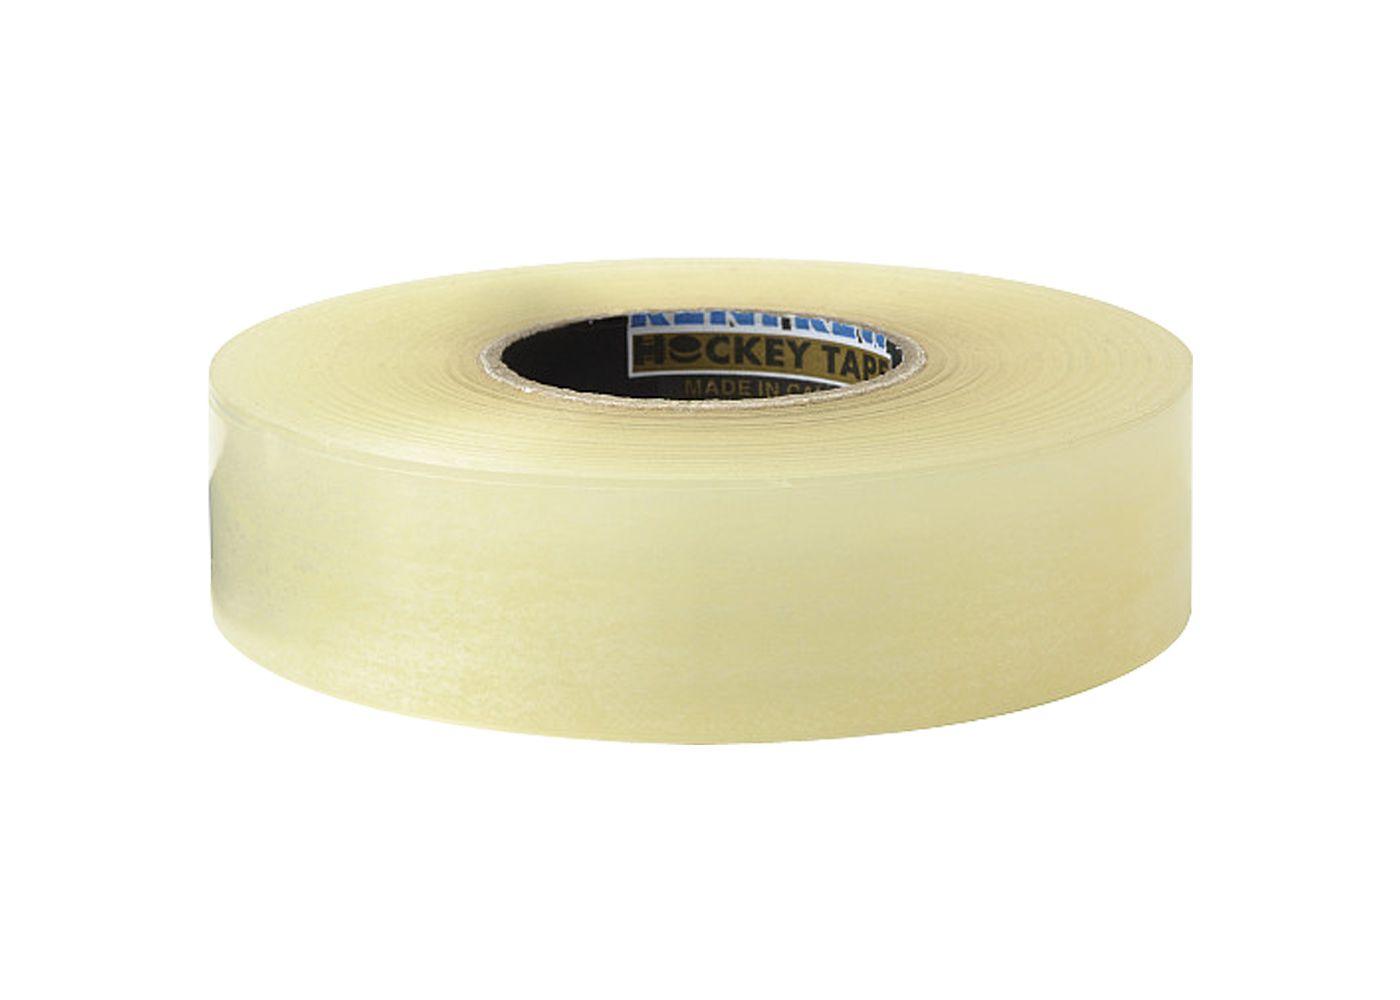 Renfrew Hockey Tape